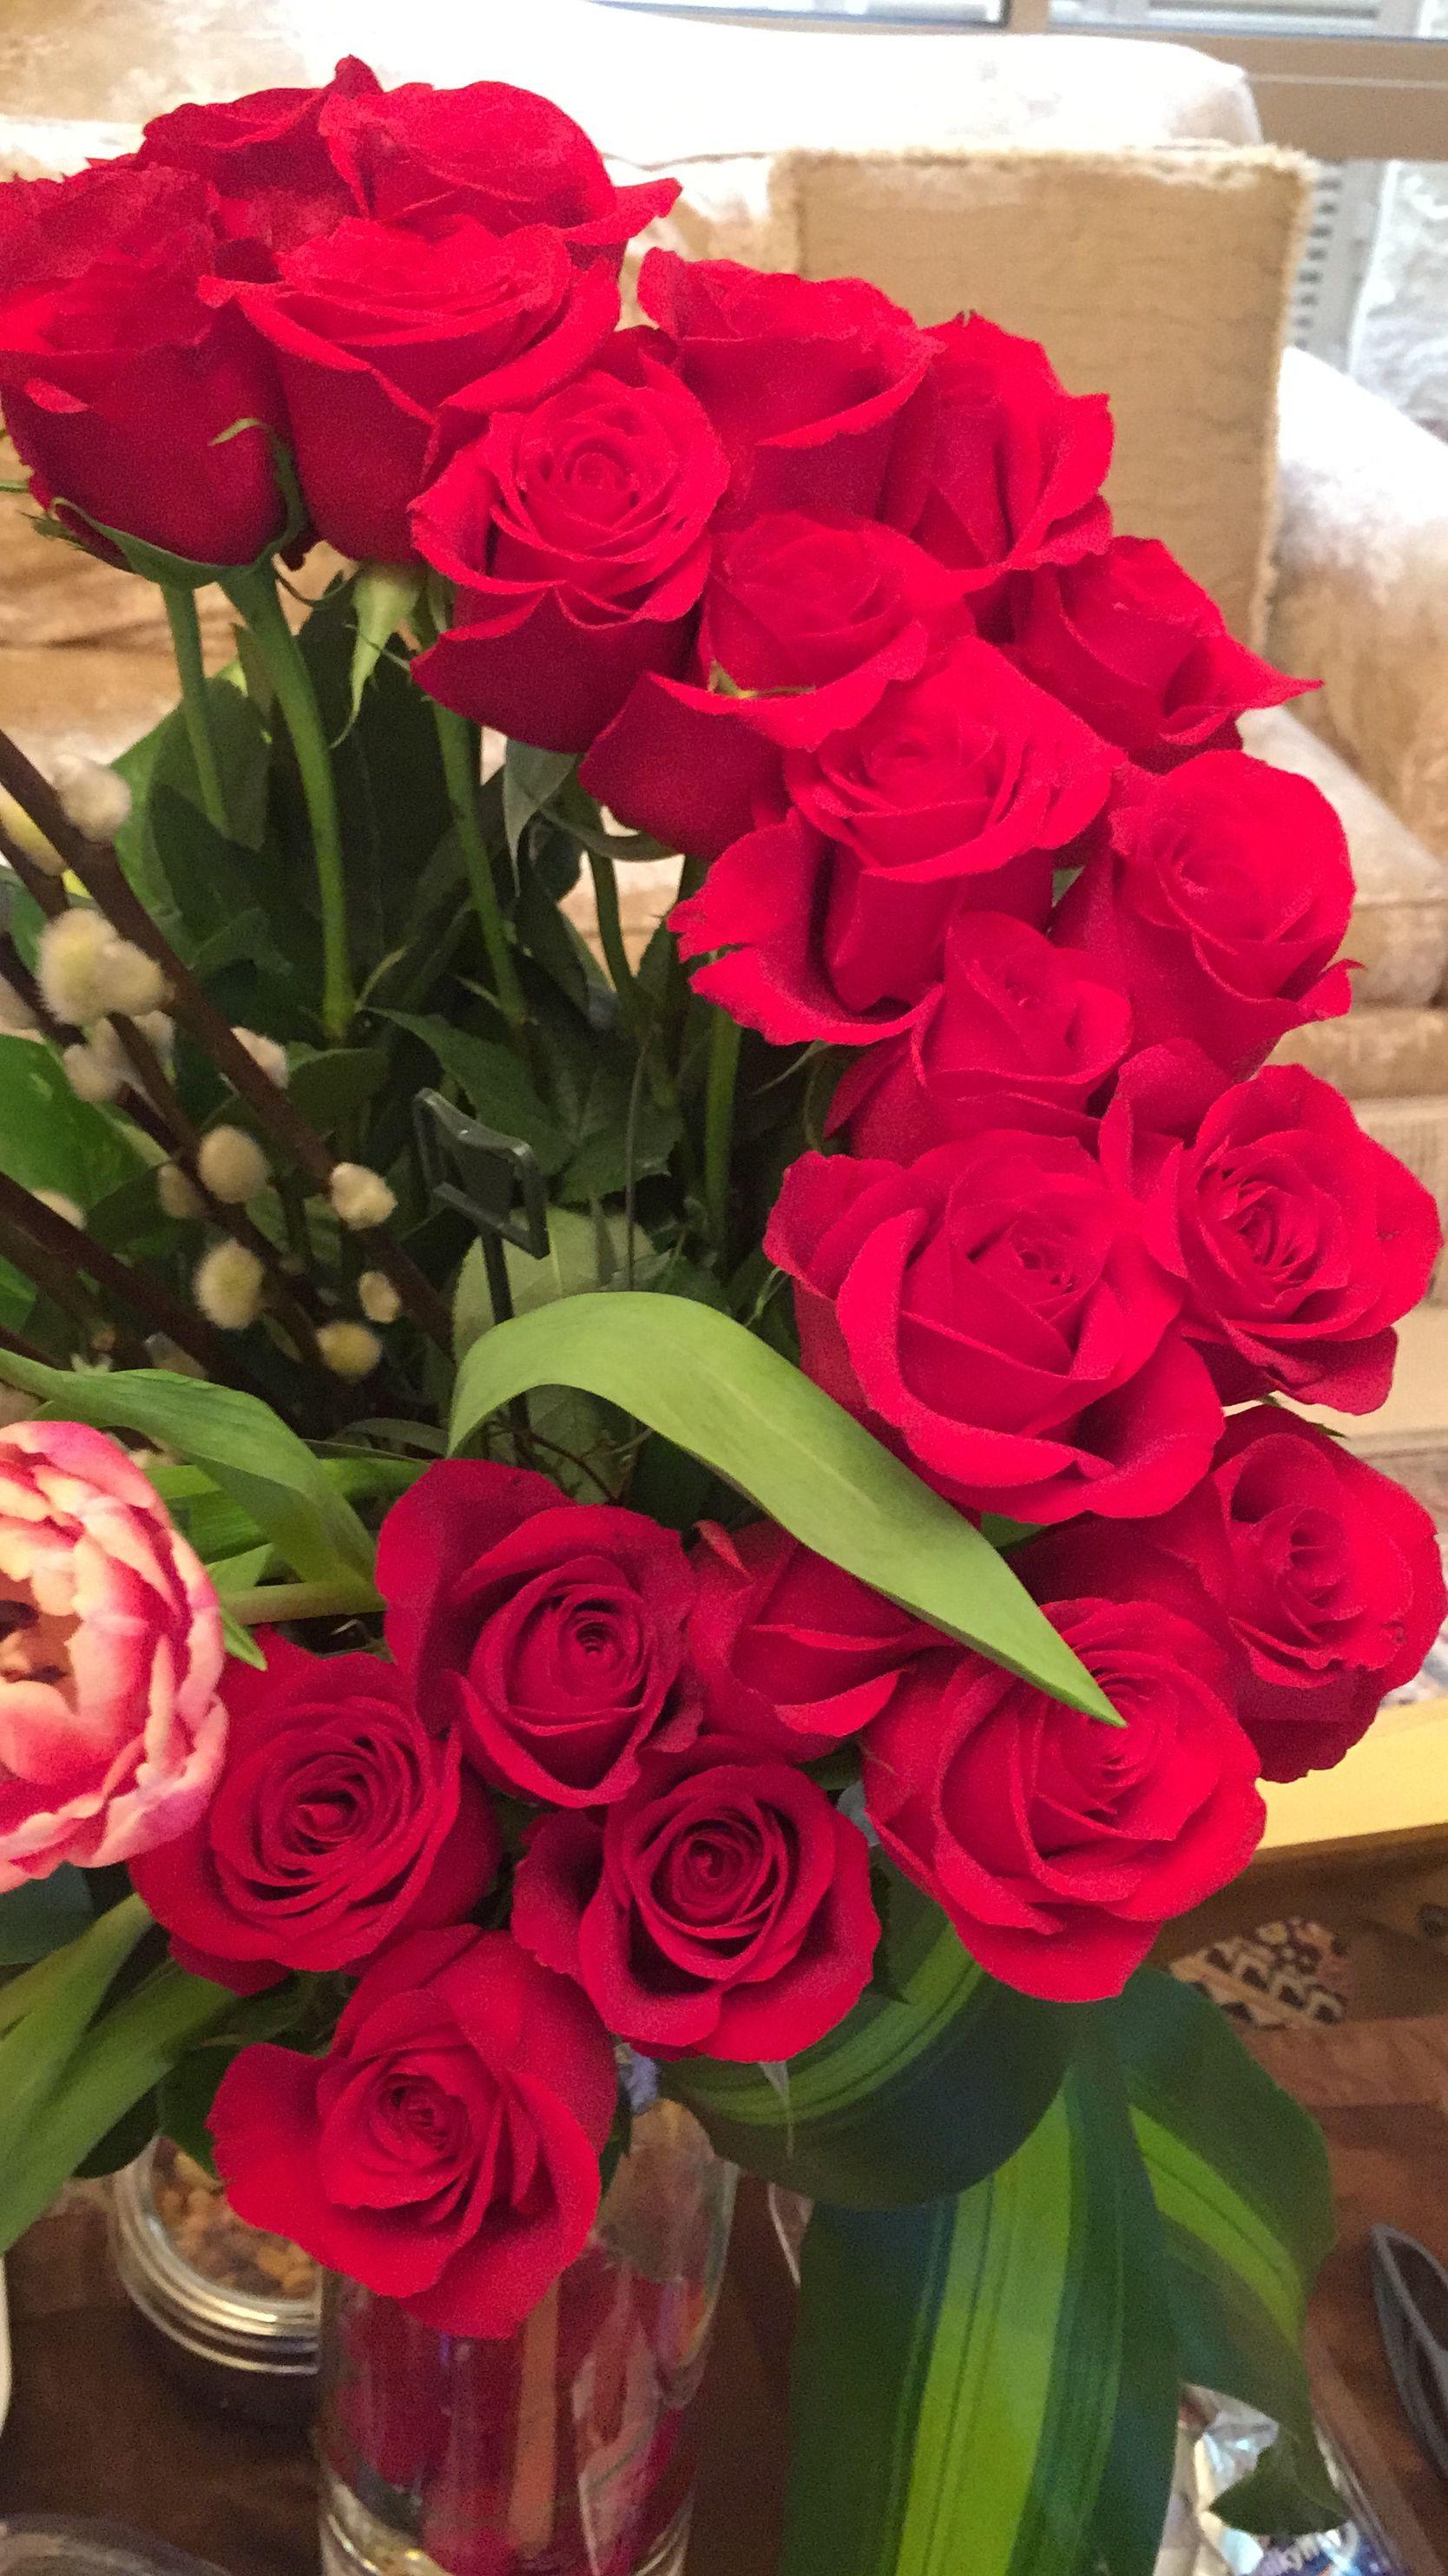 ورود الحب Rosas Vermelhas Rosa Do Deserto Rosas